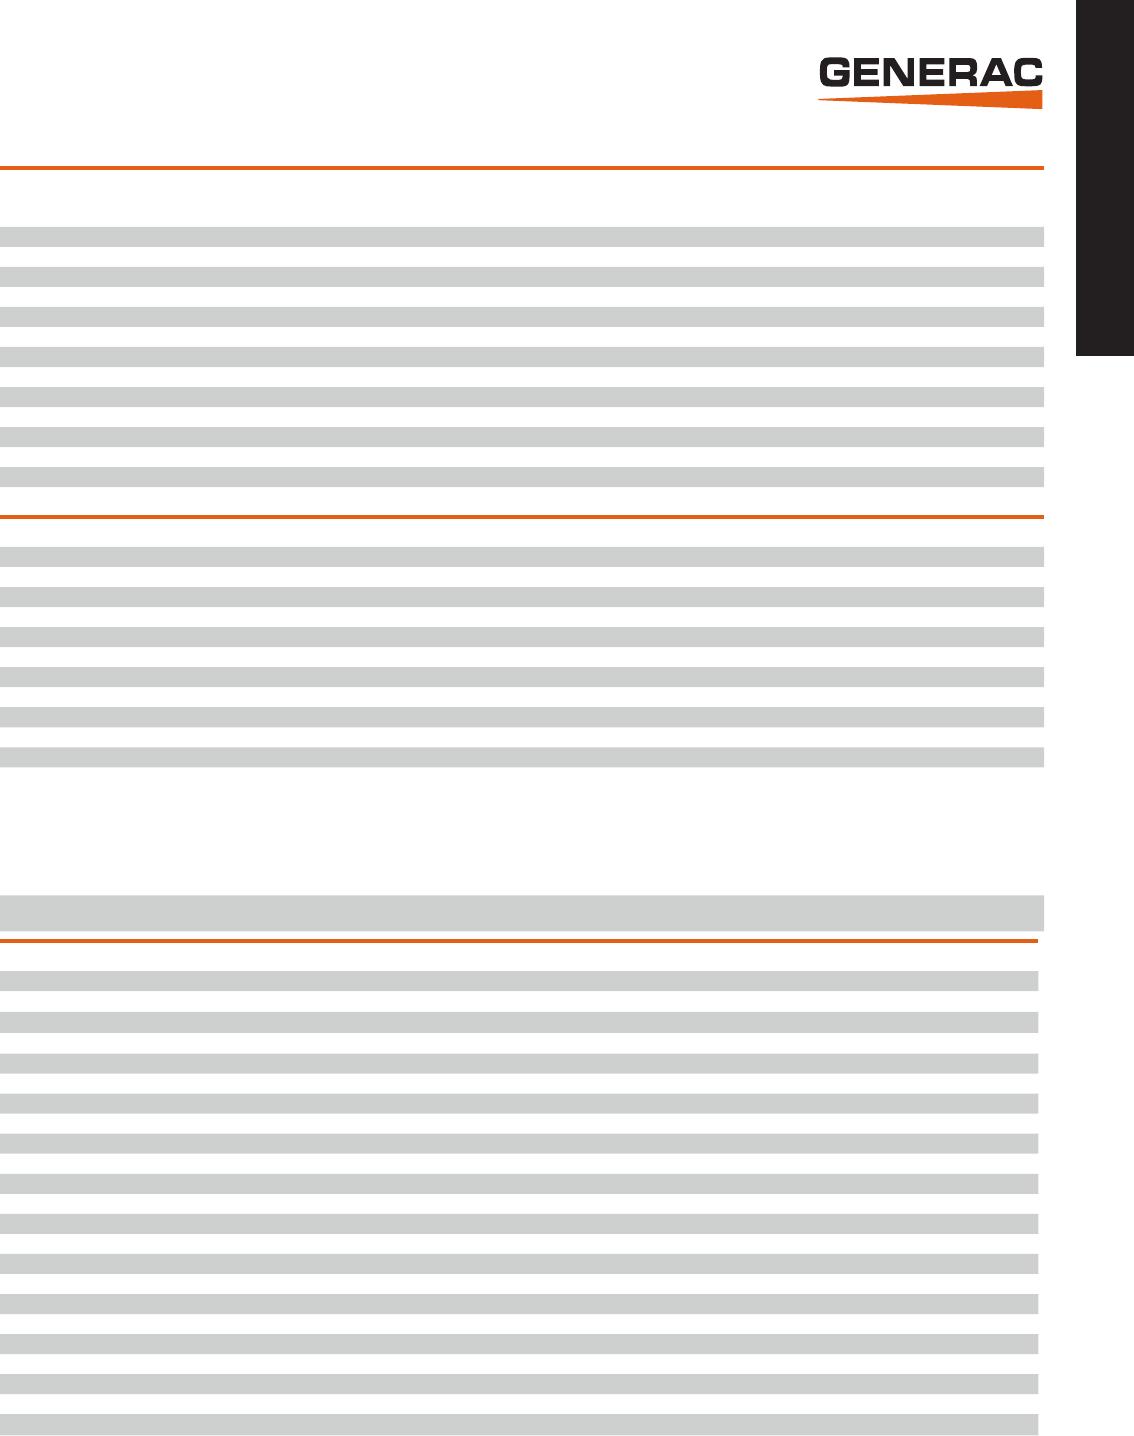 536679 1 Generac 6438 Brochure Pump 536679_1_Generac User Manual on